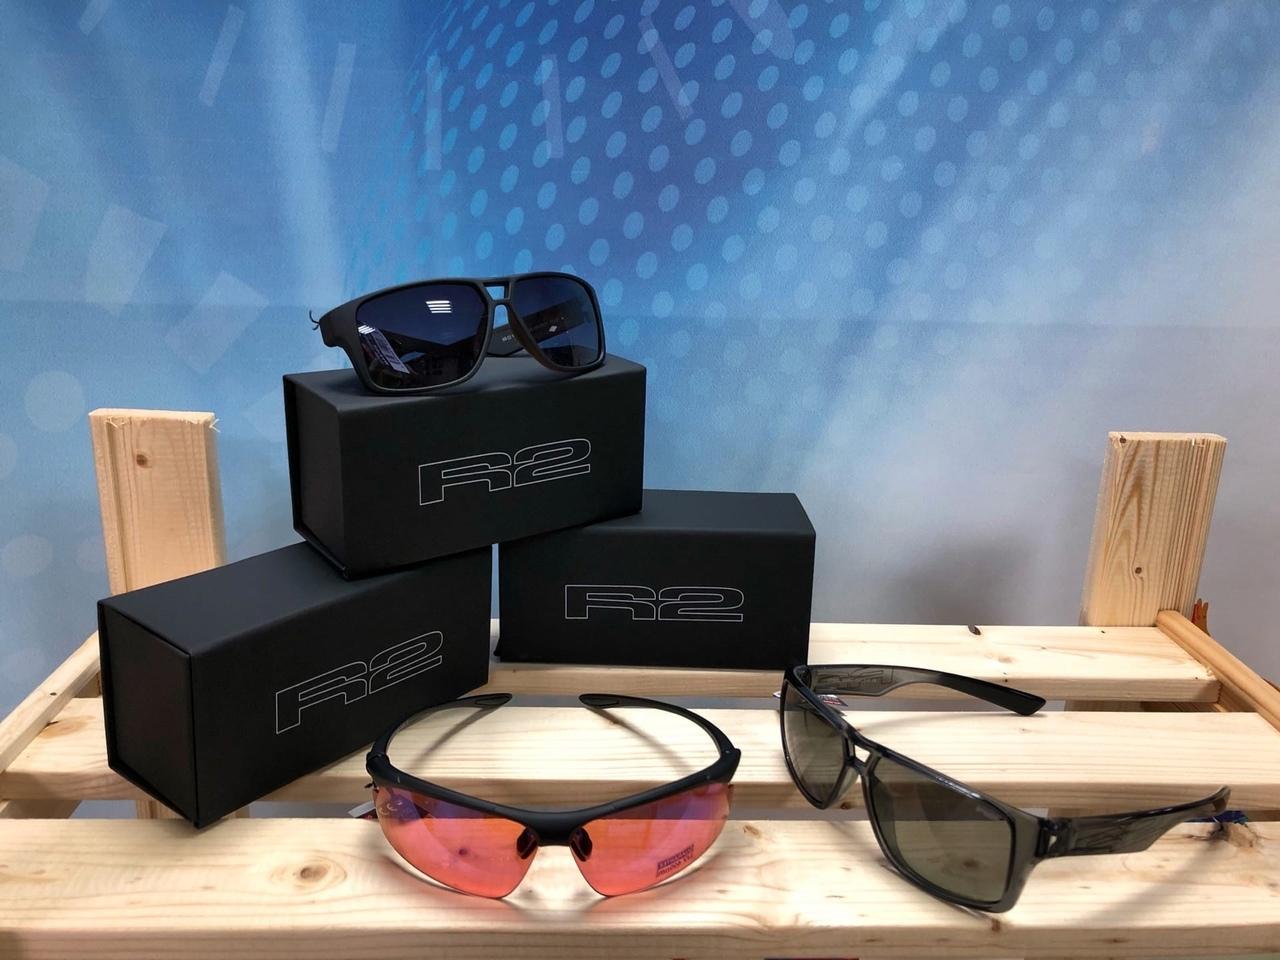 Спортивные очки R2 master, peak